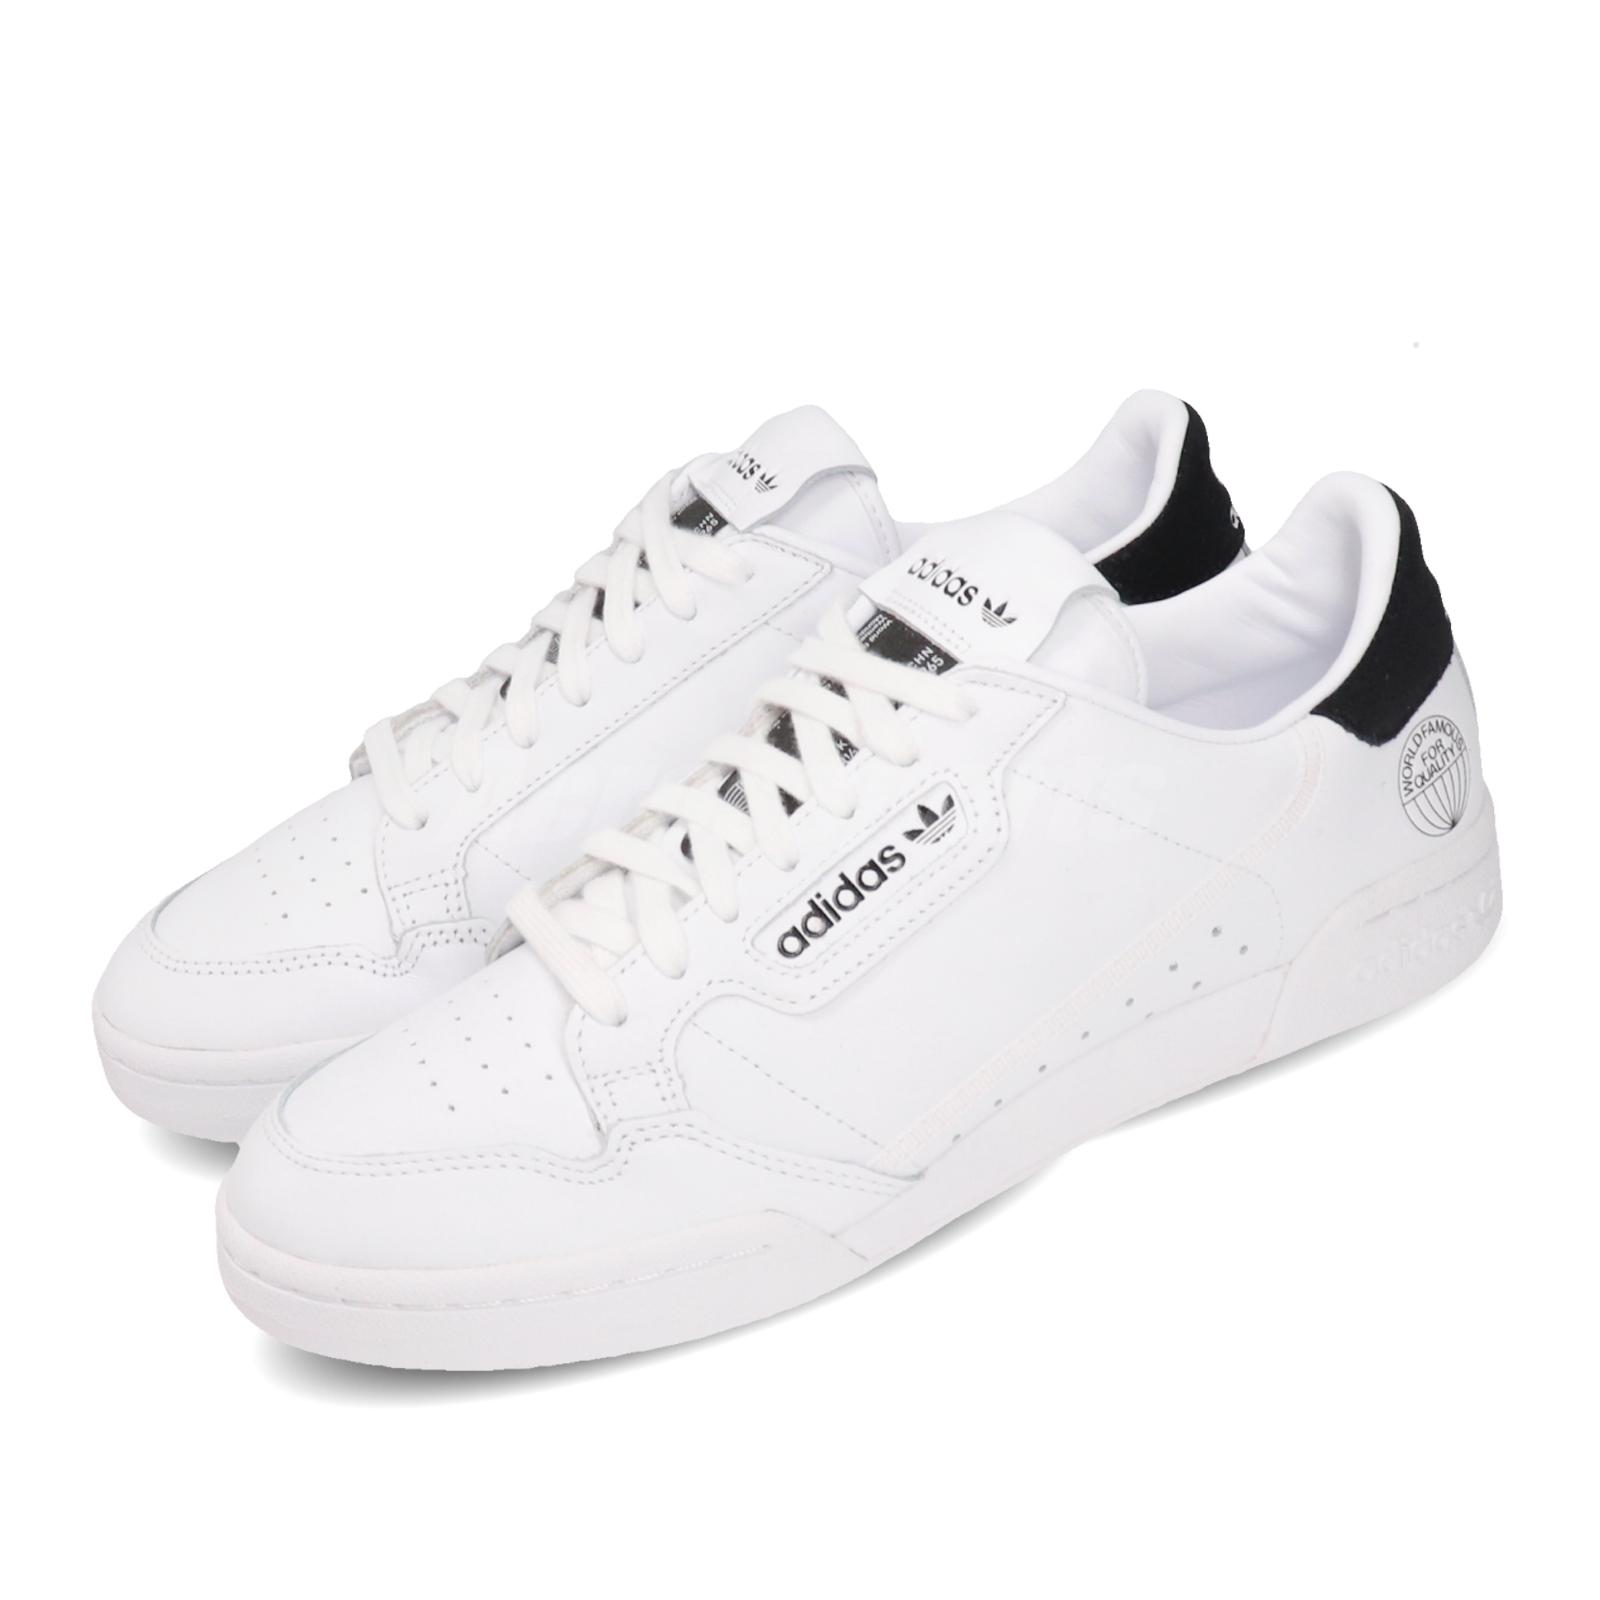 adidas Originals Continental 80 World